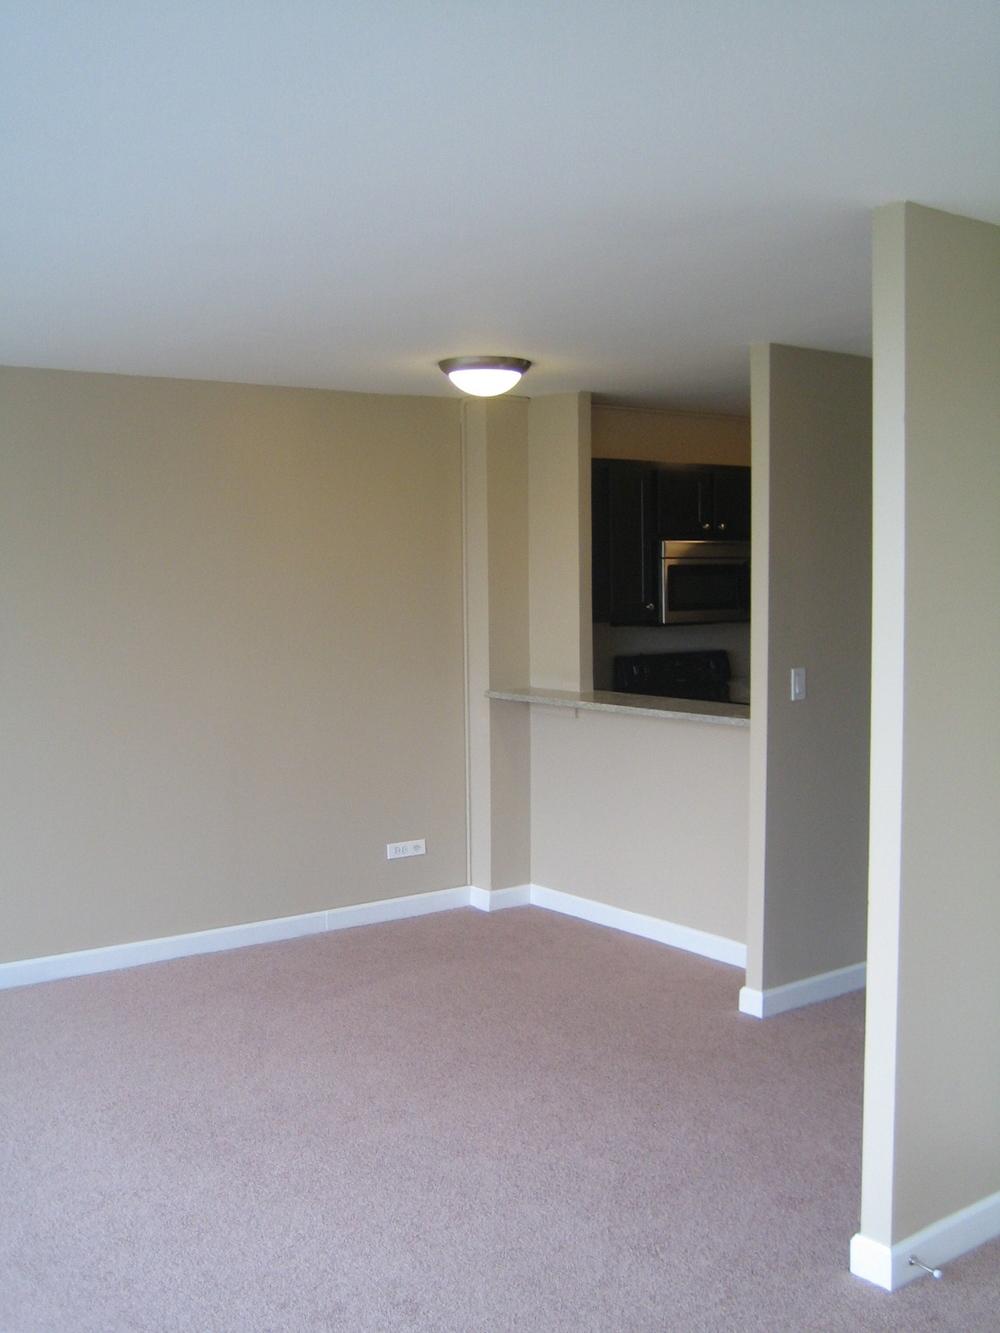 Rental Properties Mv Construction I Chicago Construction